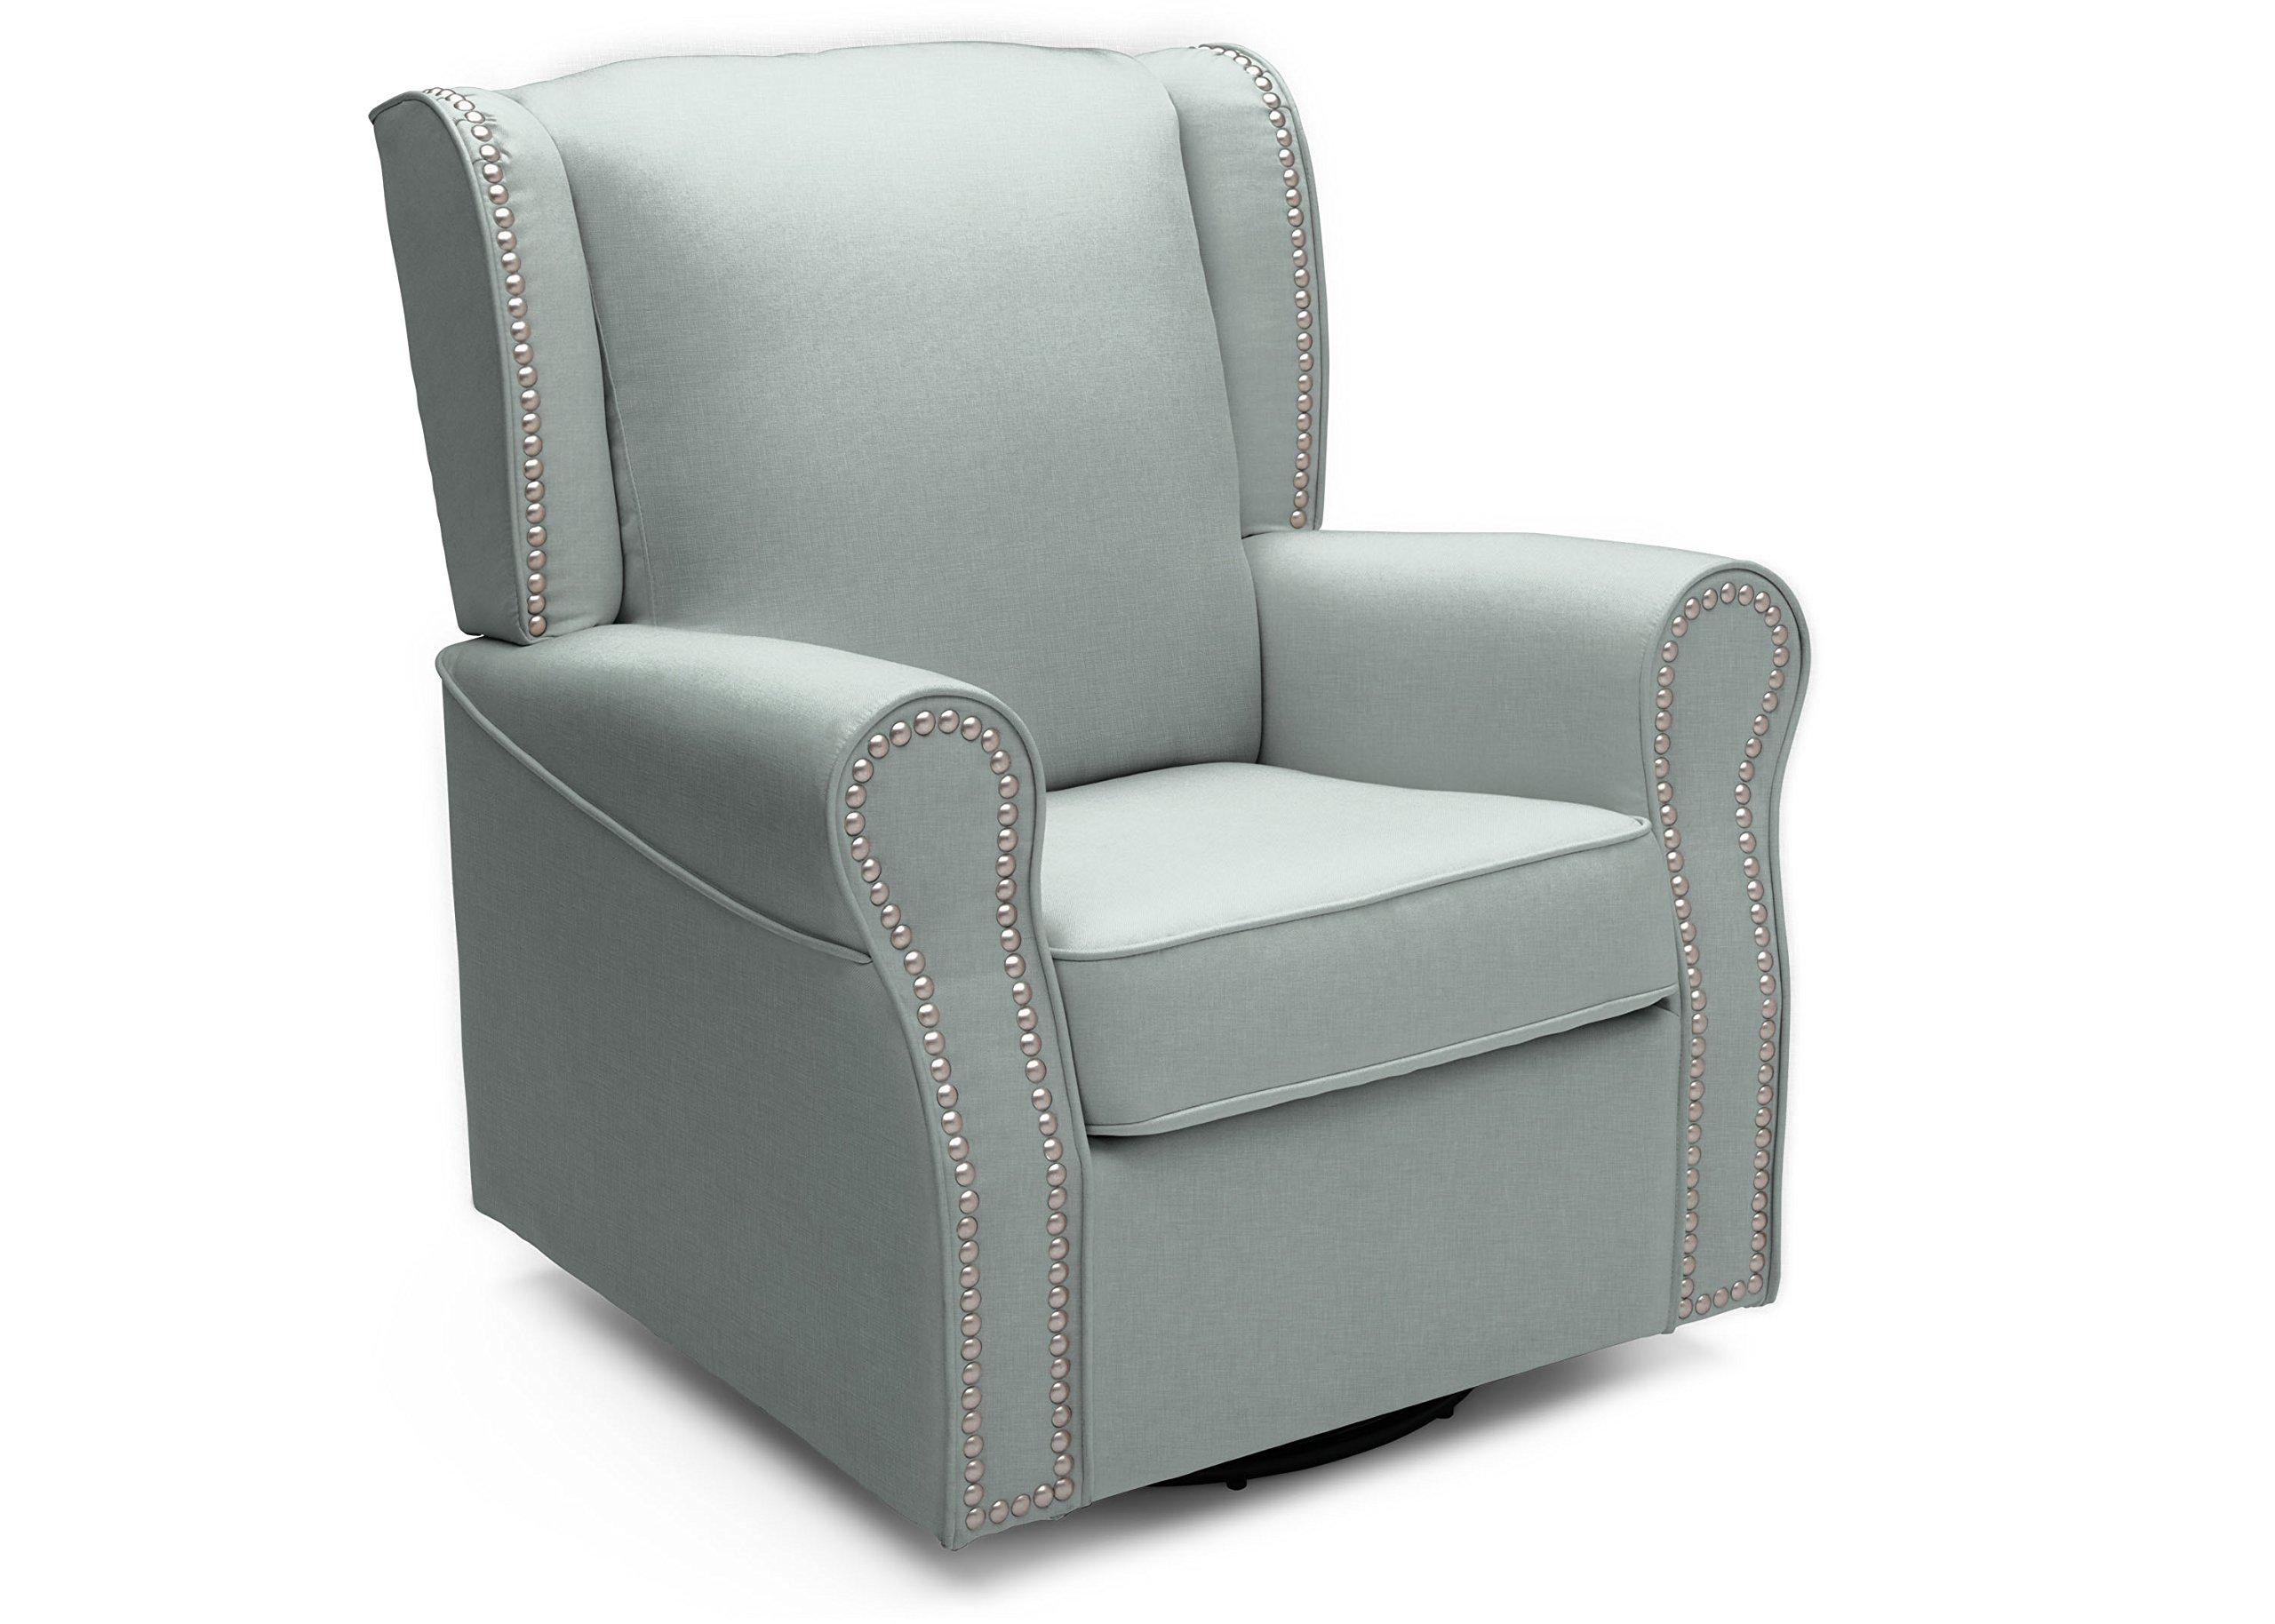 Delta Furniture Middleton Upholstered Glider Swivel Rocker Chair, Sea Breeze